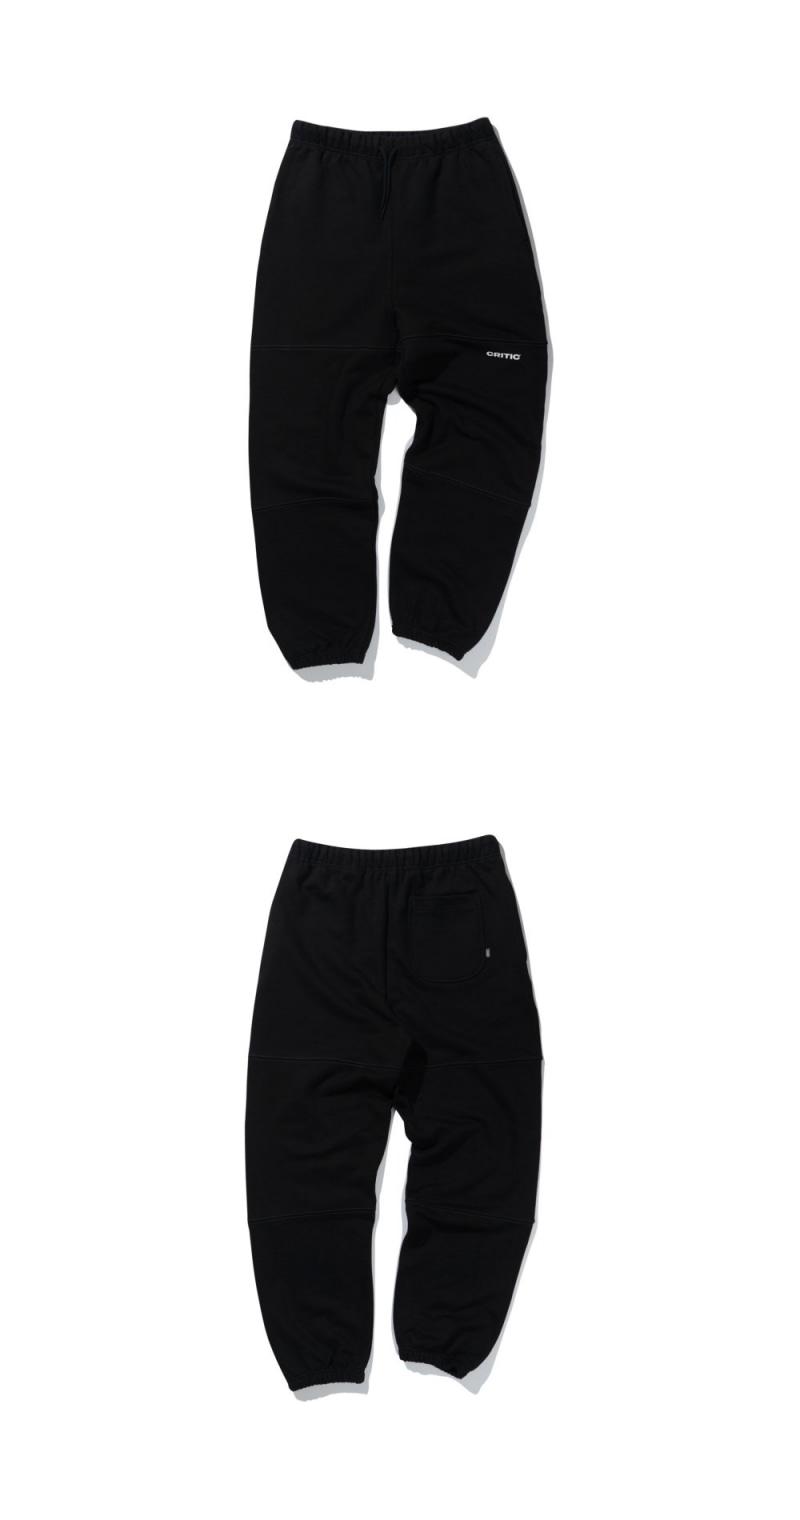 HEAVY SWEAT PANTS(BLACK)_CTTZIPT02UC6